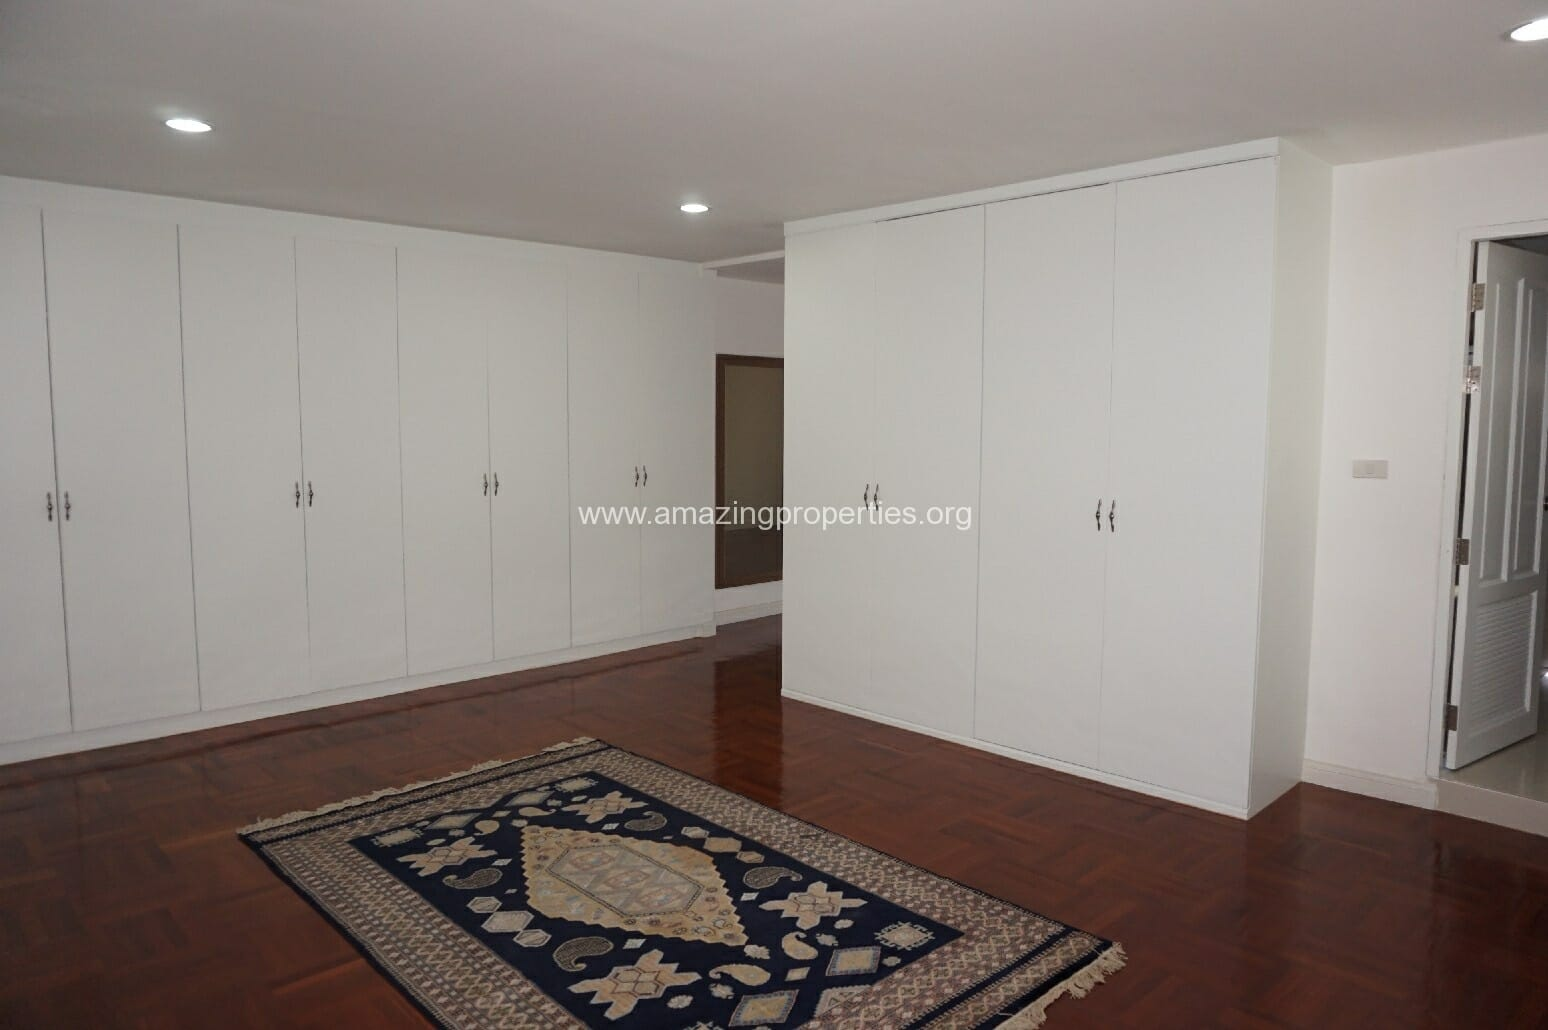 4 Bedroom Grand Ville House 2-15